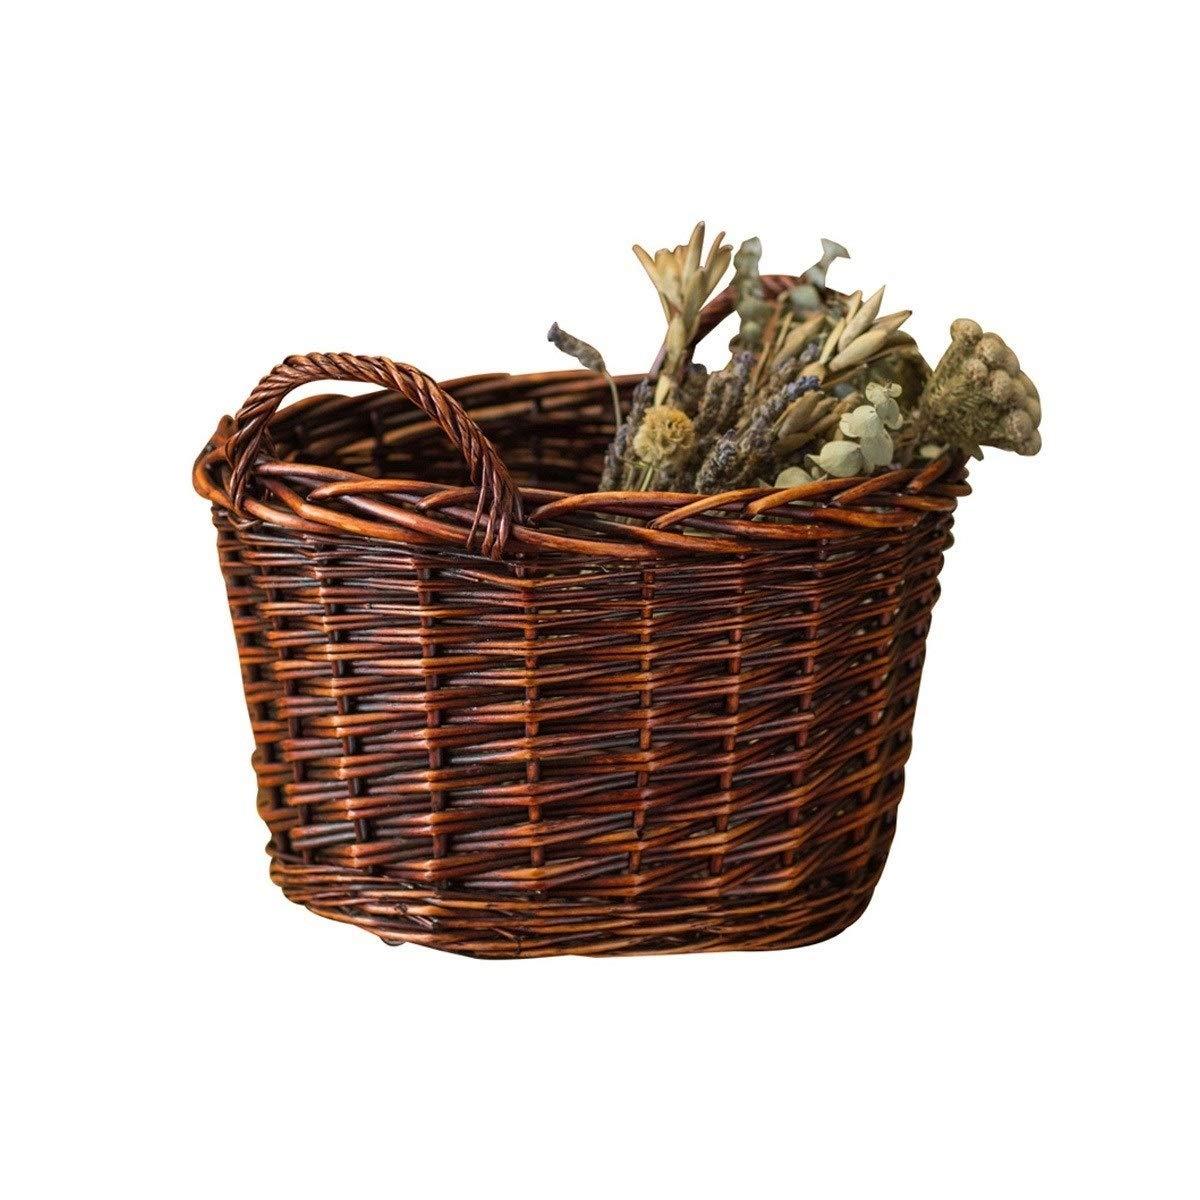 QINRUIKUANGSHAN Wicker Dirty Clothes Storage Basket, Basket Rattan Frame, Kitchen Woven Bamboo Basket, Storage Basket Large Bread Basket, (Color : Natural, Size : 2824cm) by QINRUIKUANGSHAN